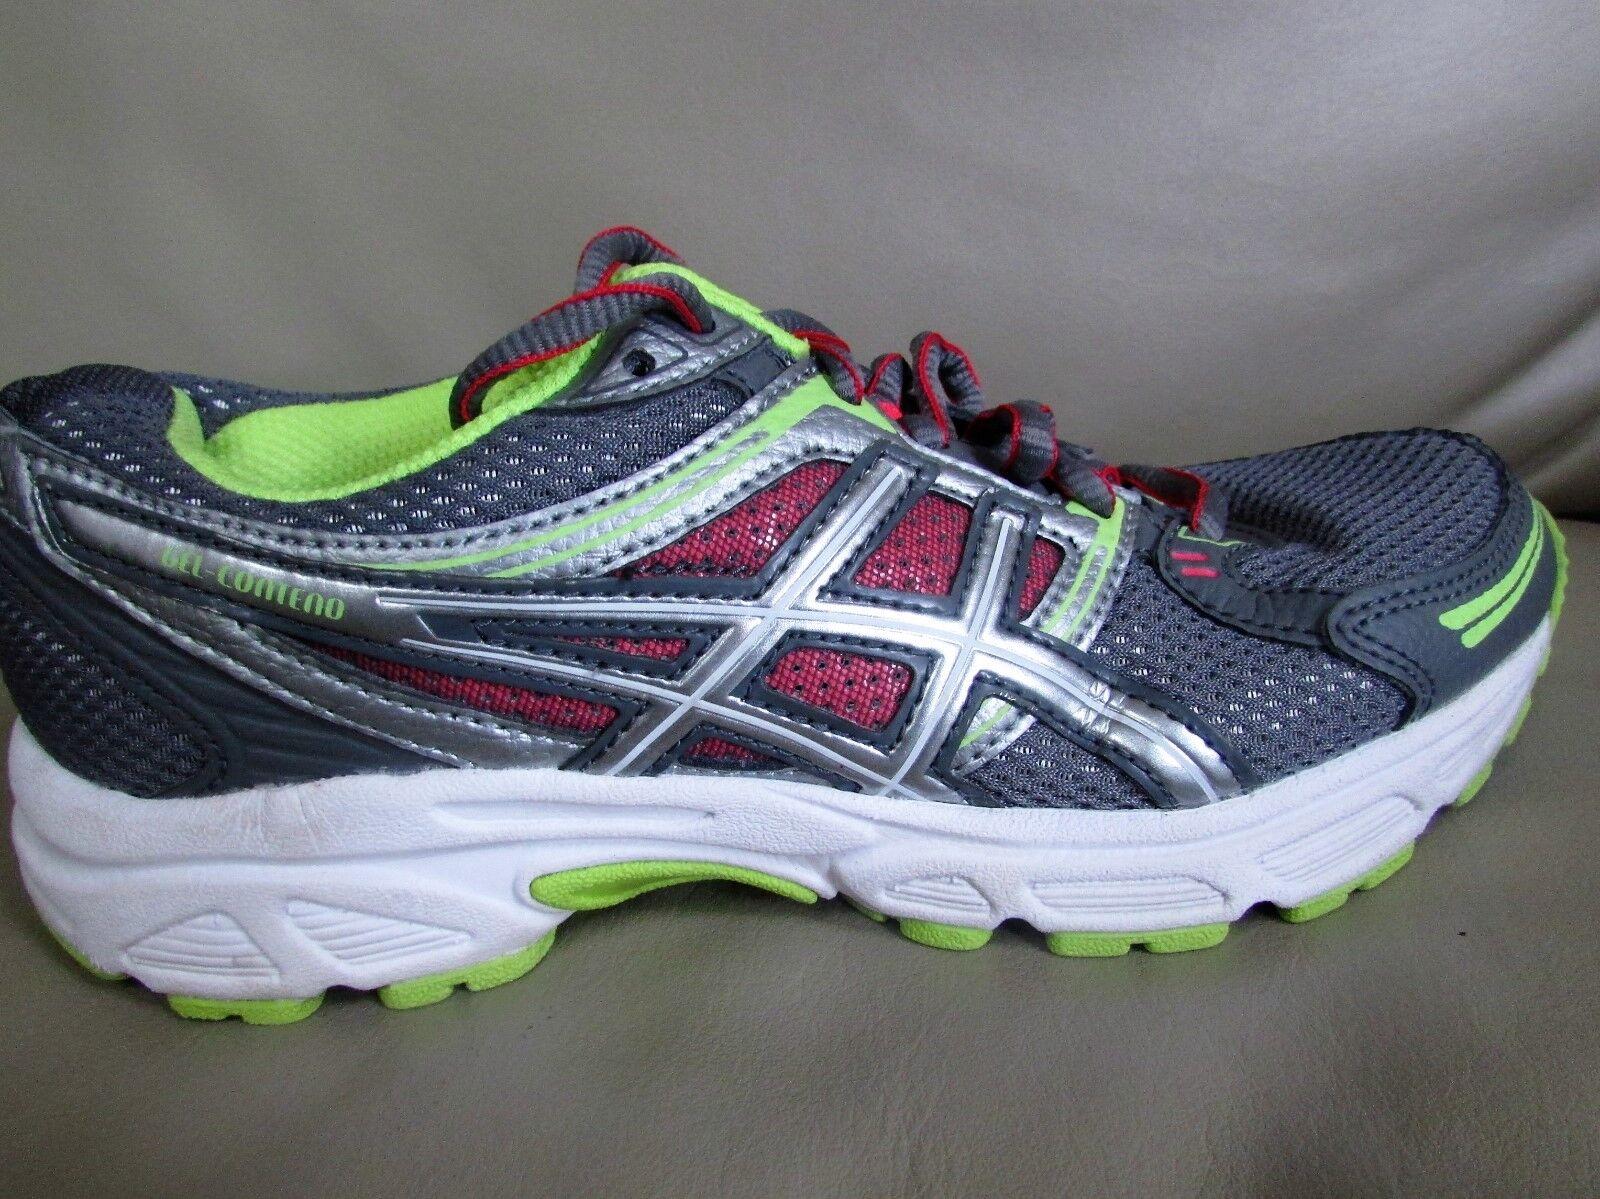 Gel D'athlétisme Gris Vert T2f9n Asics Chaussures qBYBHw